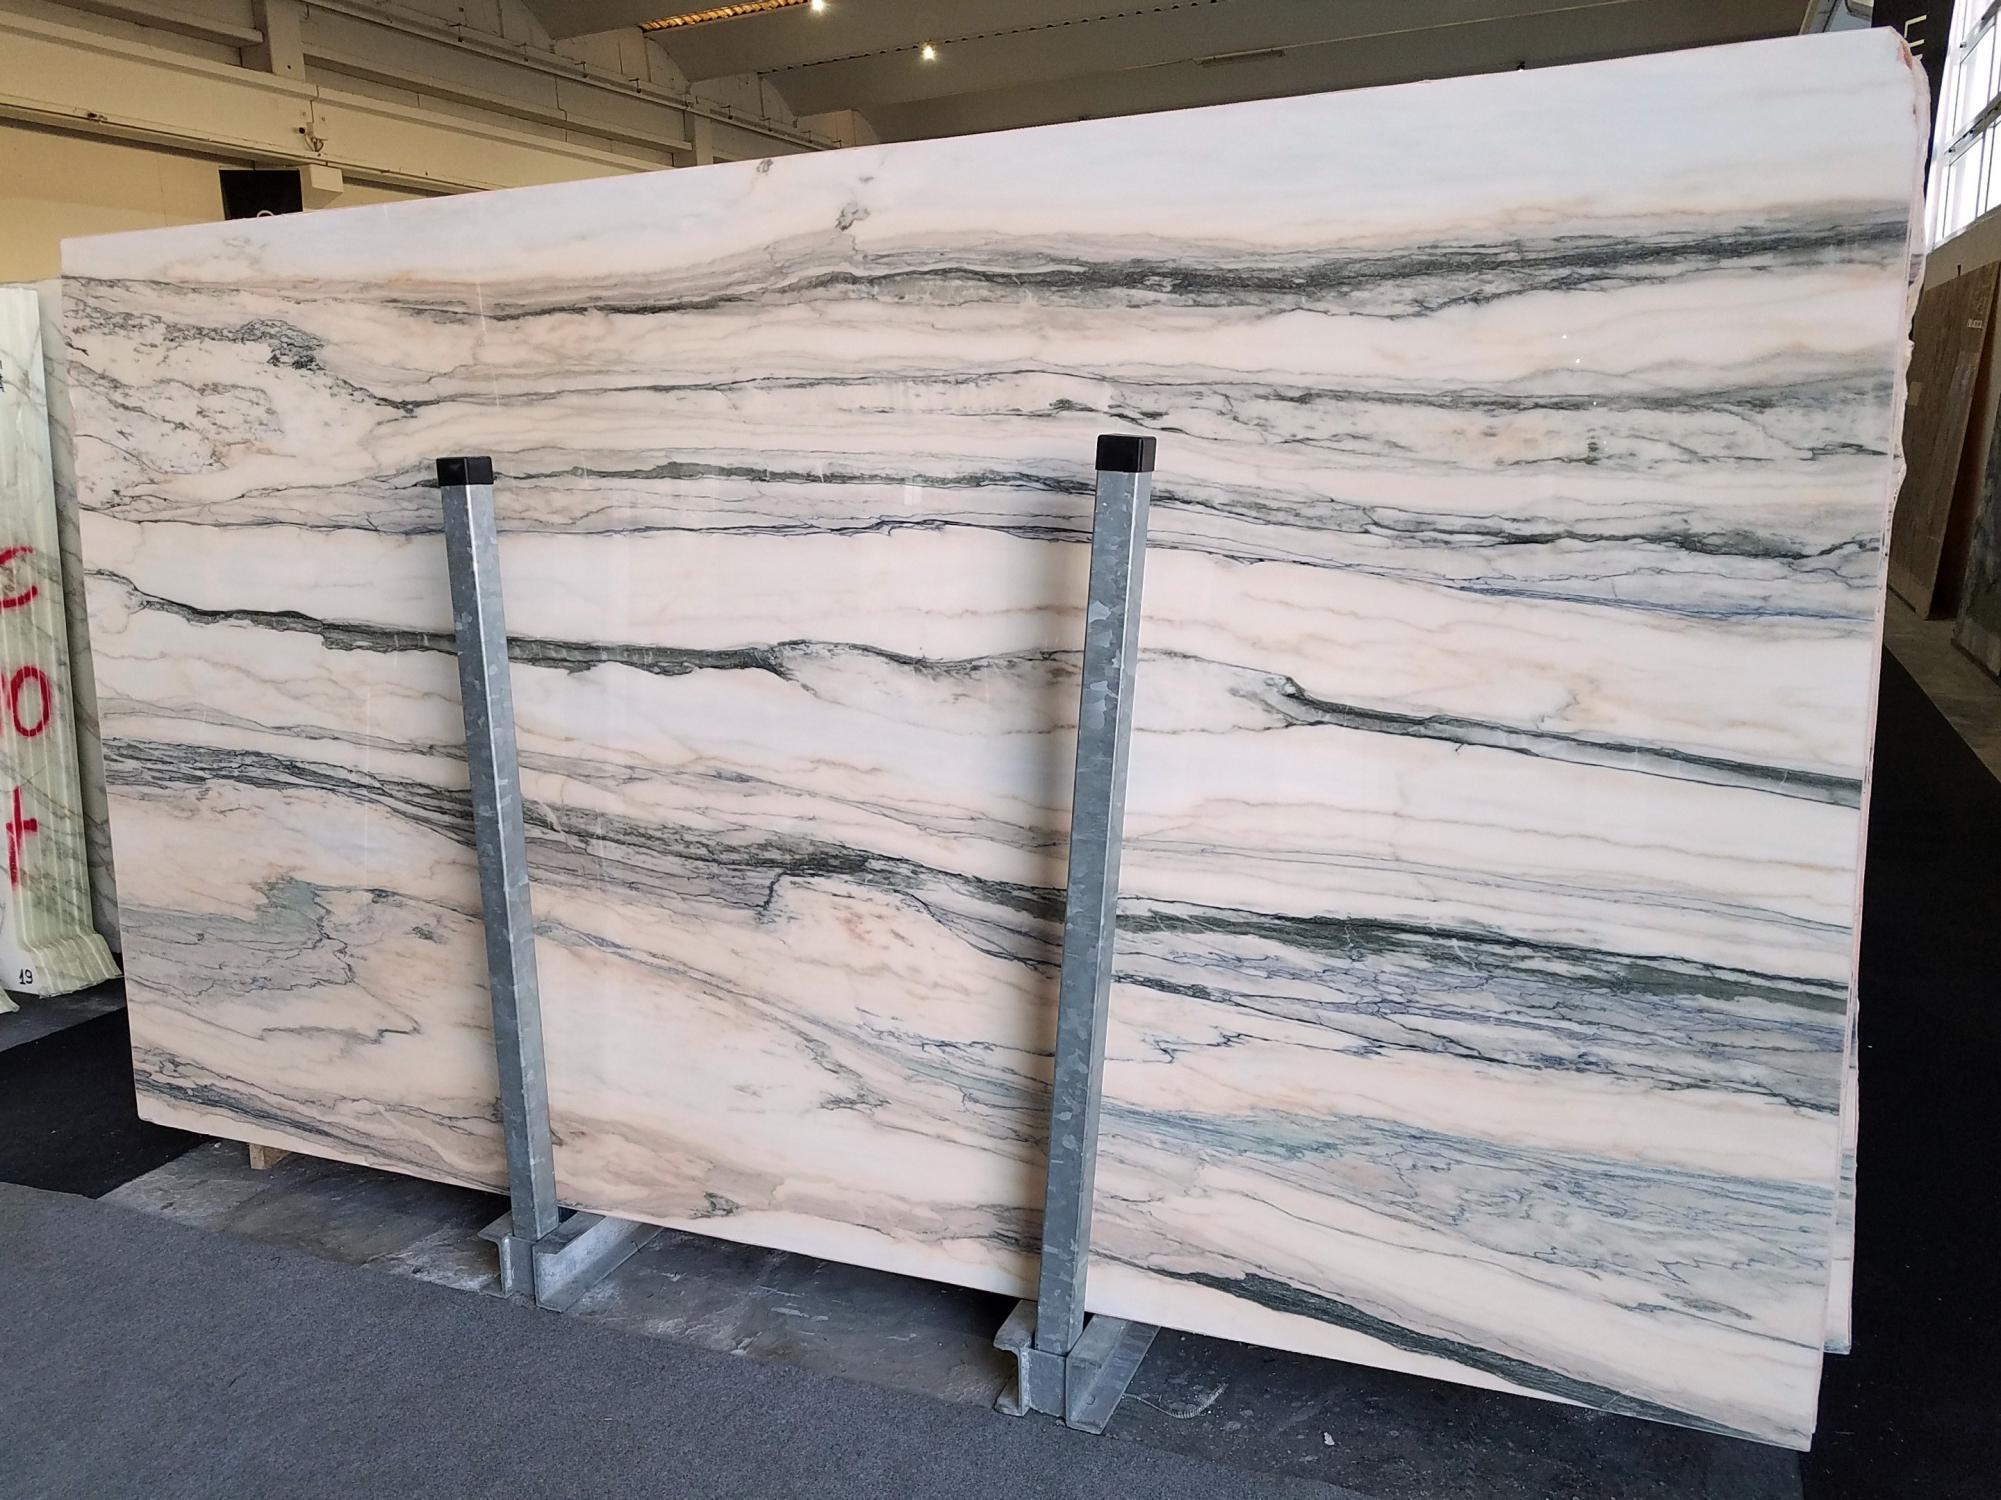 CALACATTA SAINT TROPEZ Supply Veneto (Italy) polished slabs A0128 , Slab #69 natural marble